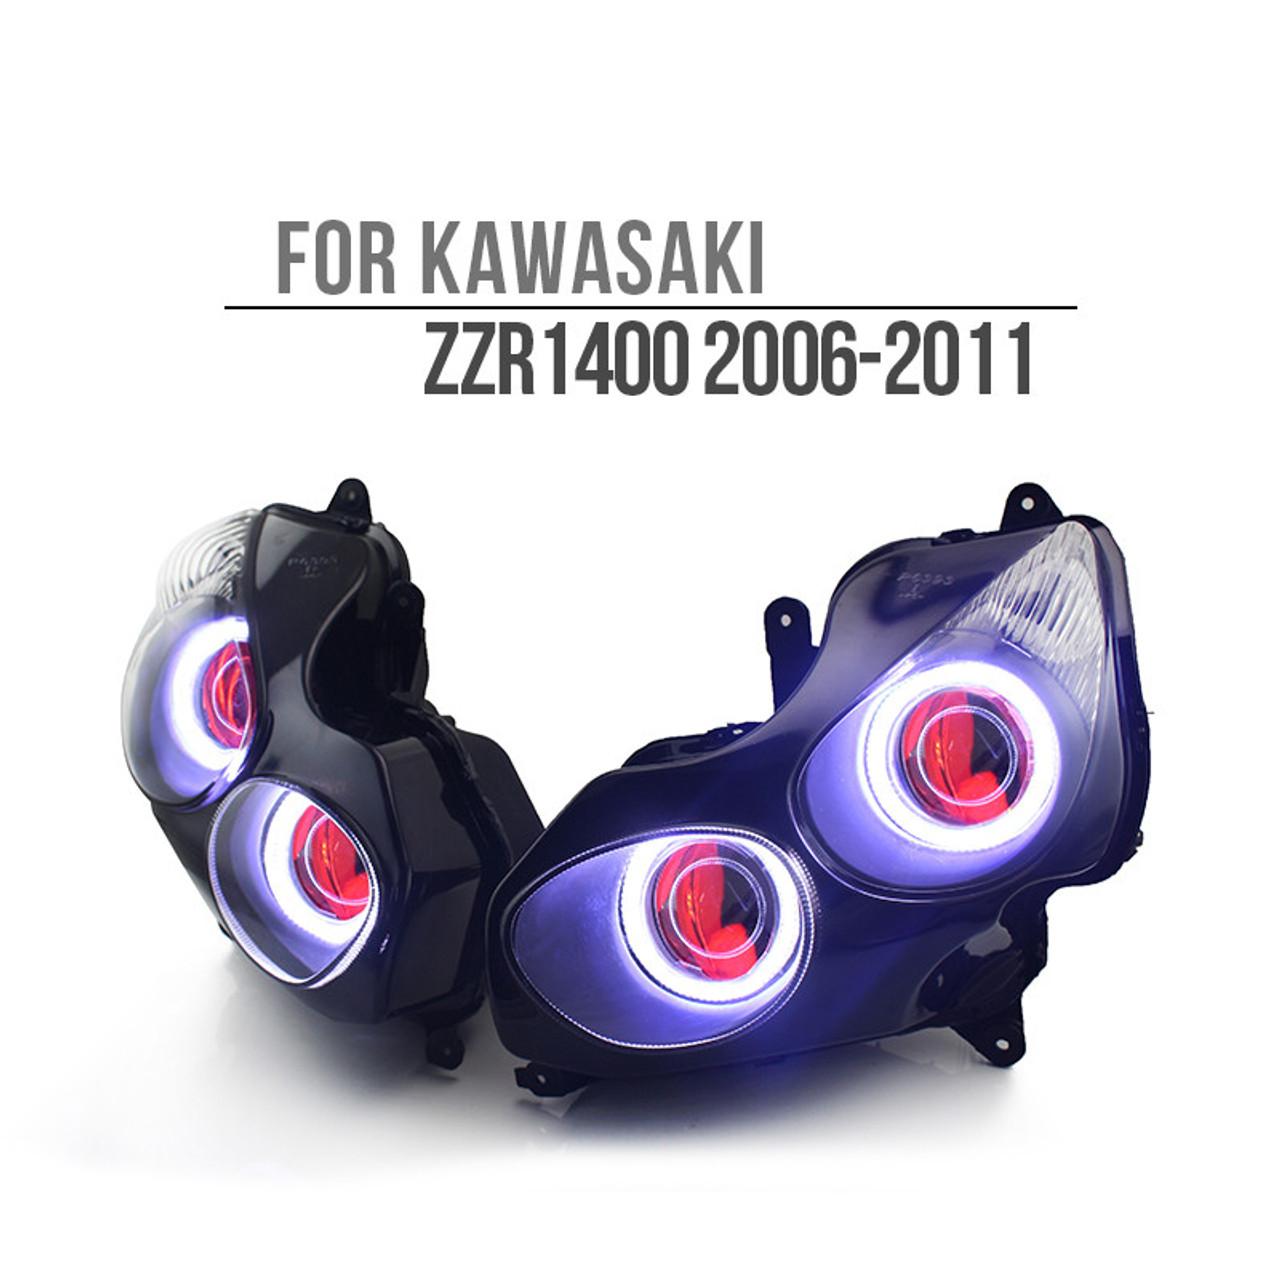 medium resolution of wiring harness 2008 zx14 wiring diagram insidekawasaki zx14r zzr1400 headlight 2006 2007 2008 2009 2010 2011